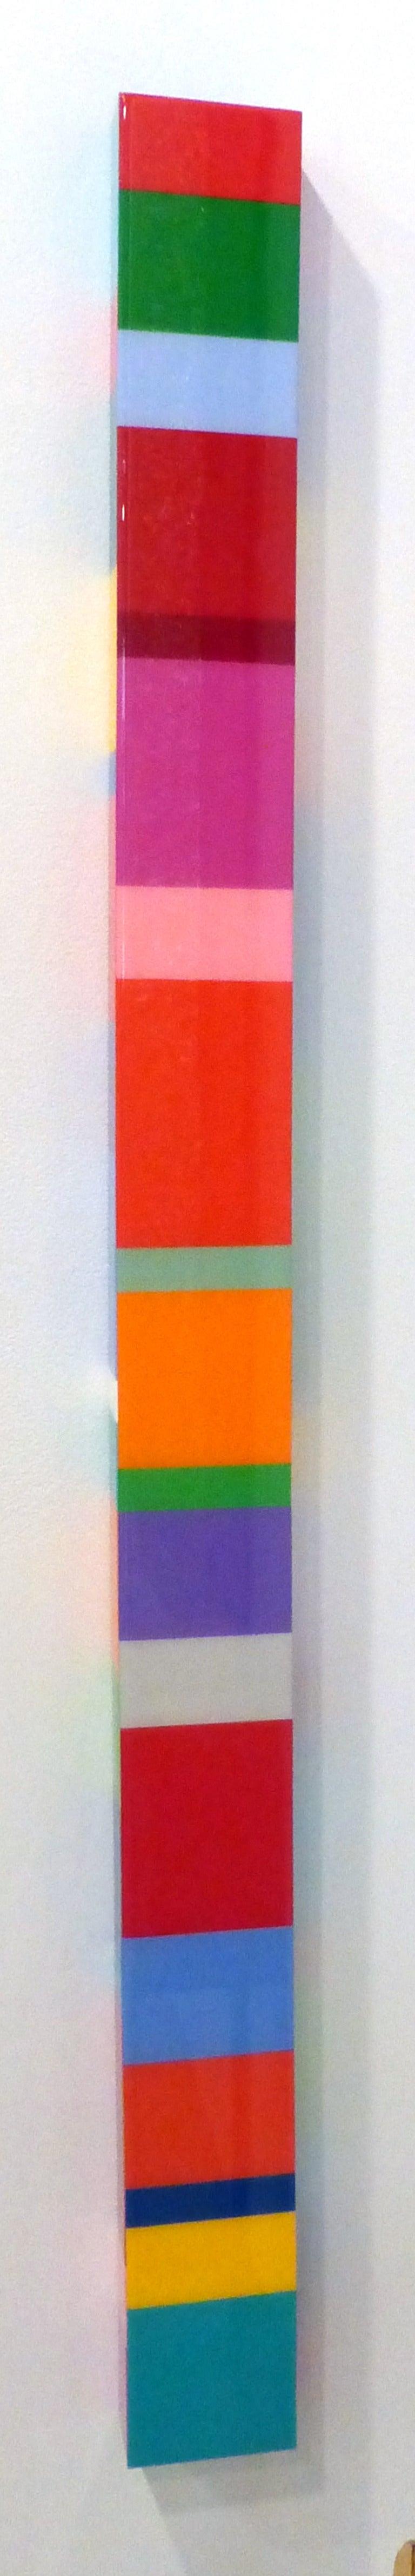 Cakewalk Artist : Heidi Spector - Cakewalk, Painting at 1stdibs